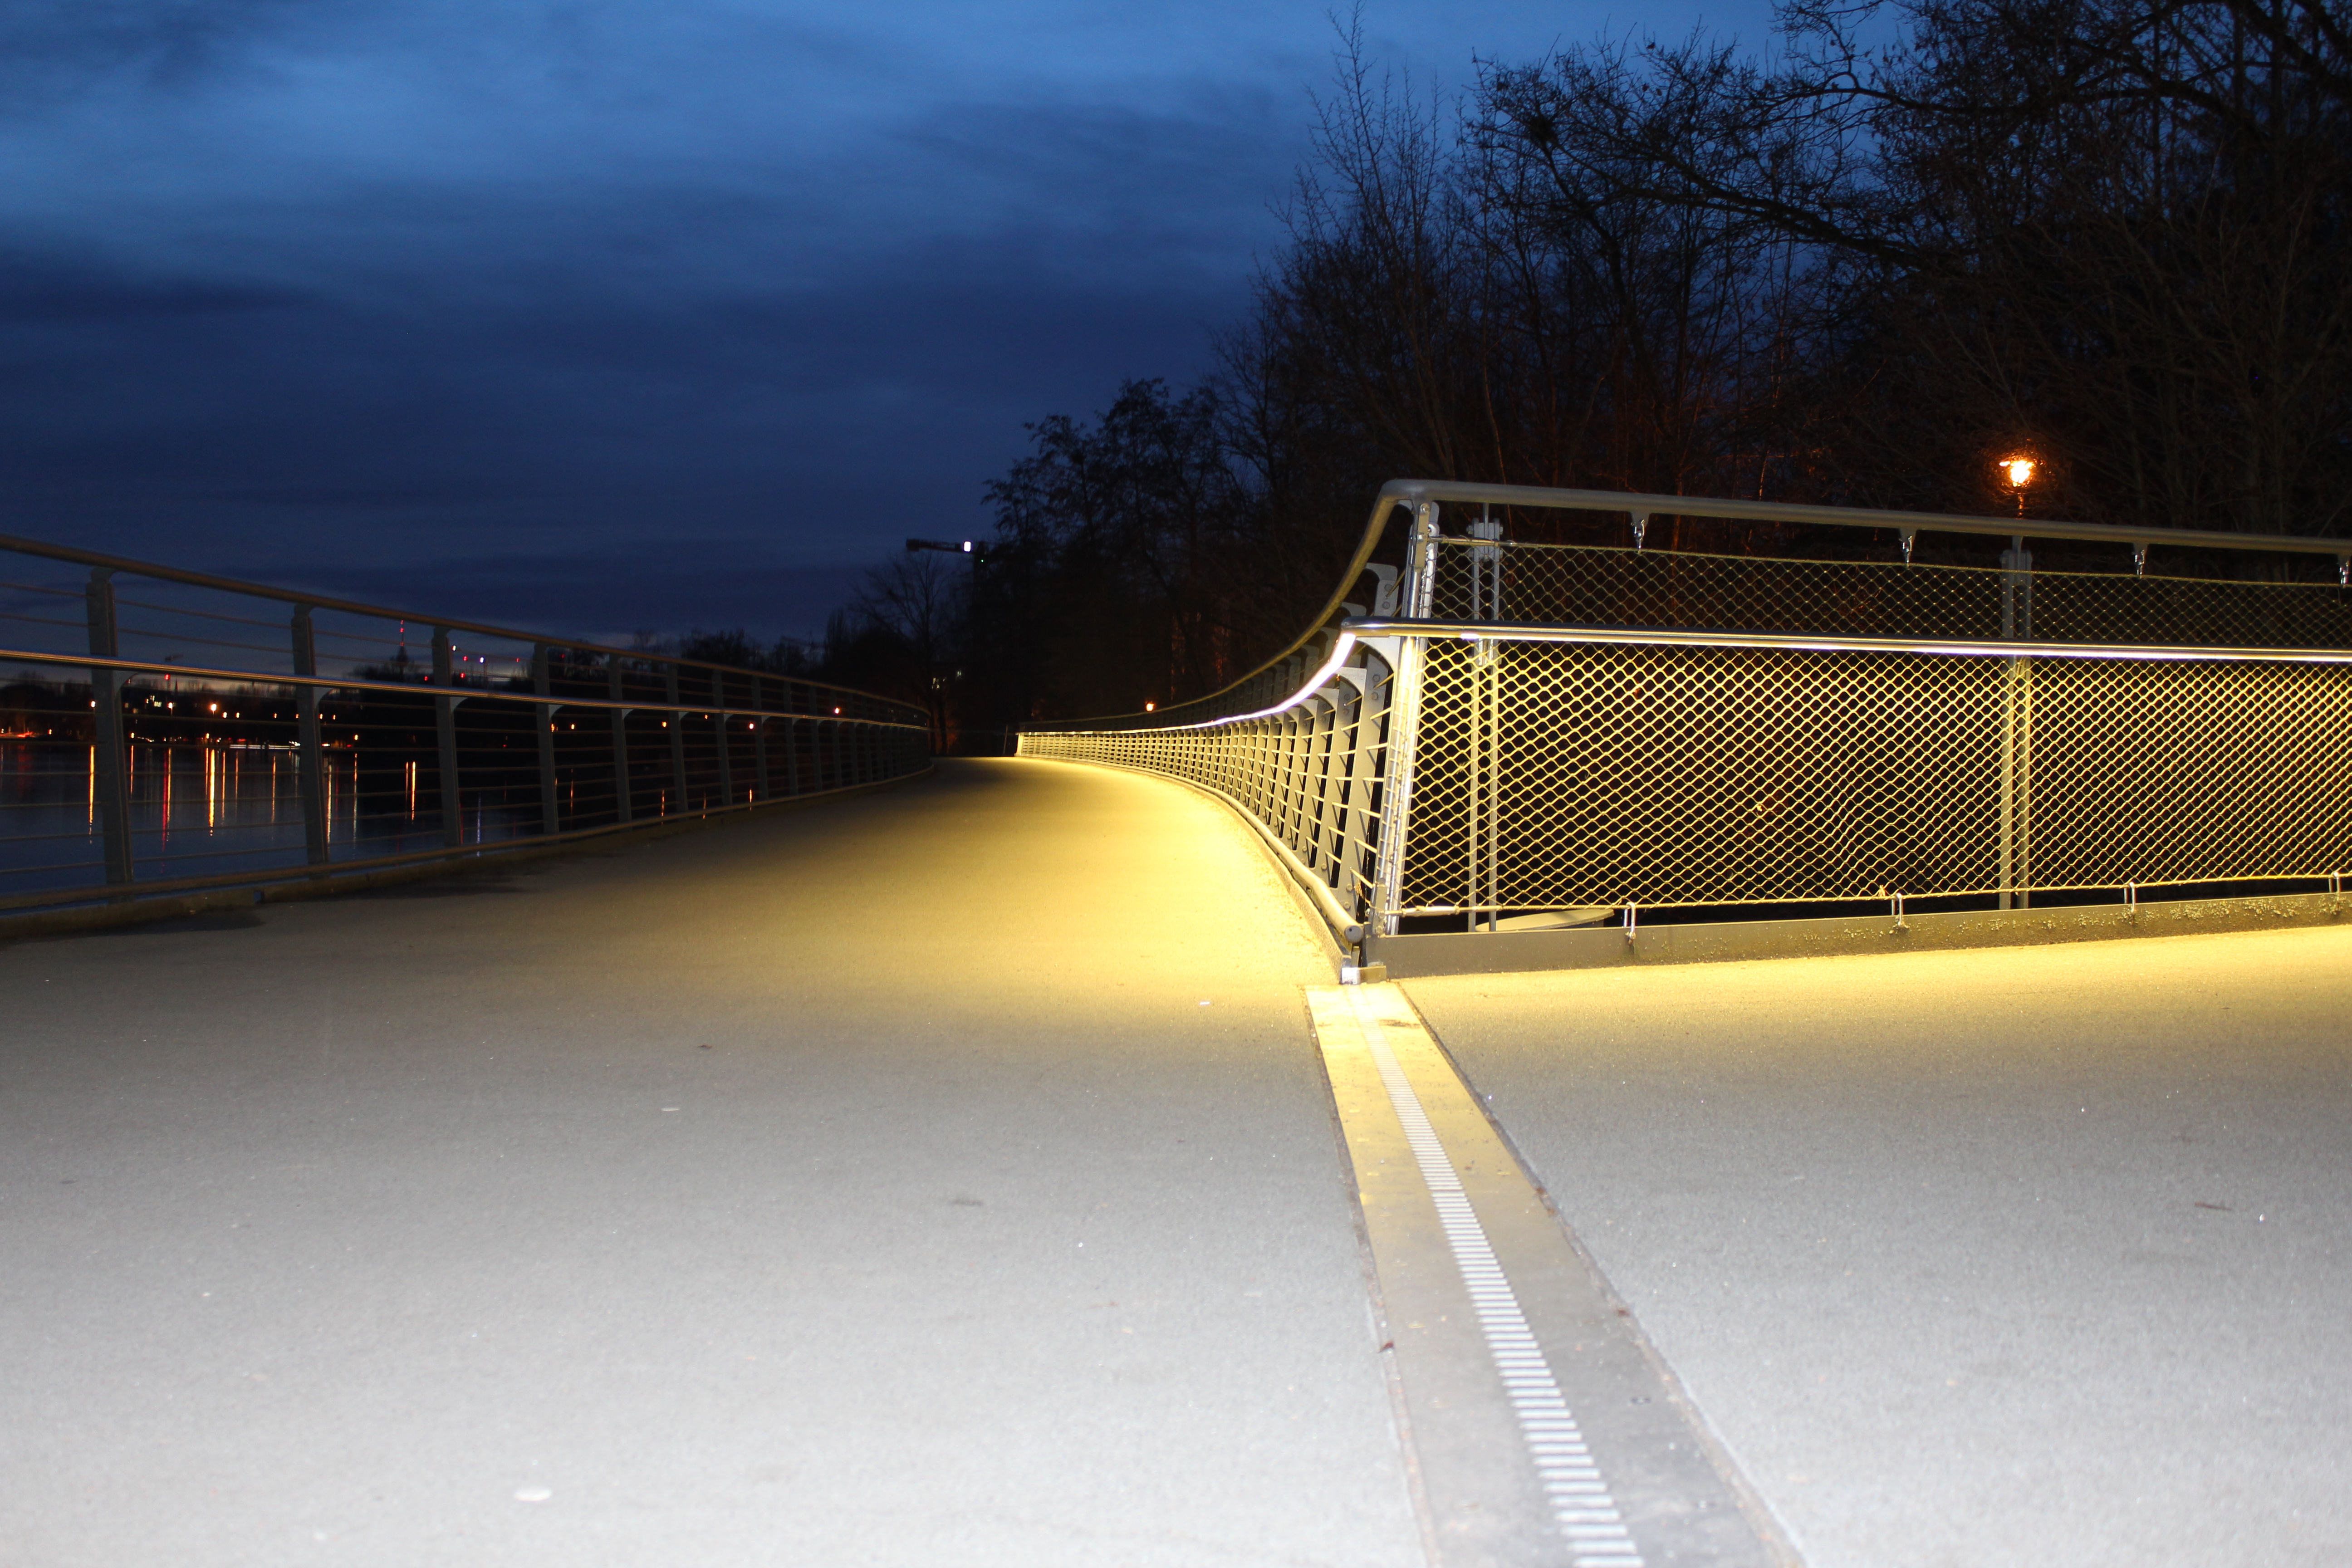 Beleuchteter Handlauf DAIDALOS® Wöhrder See Nürnberg - Hinten